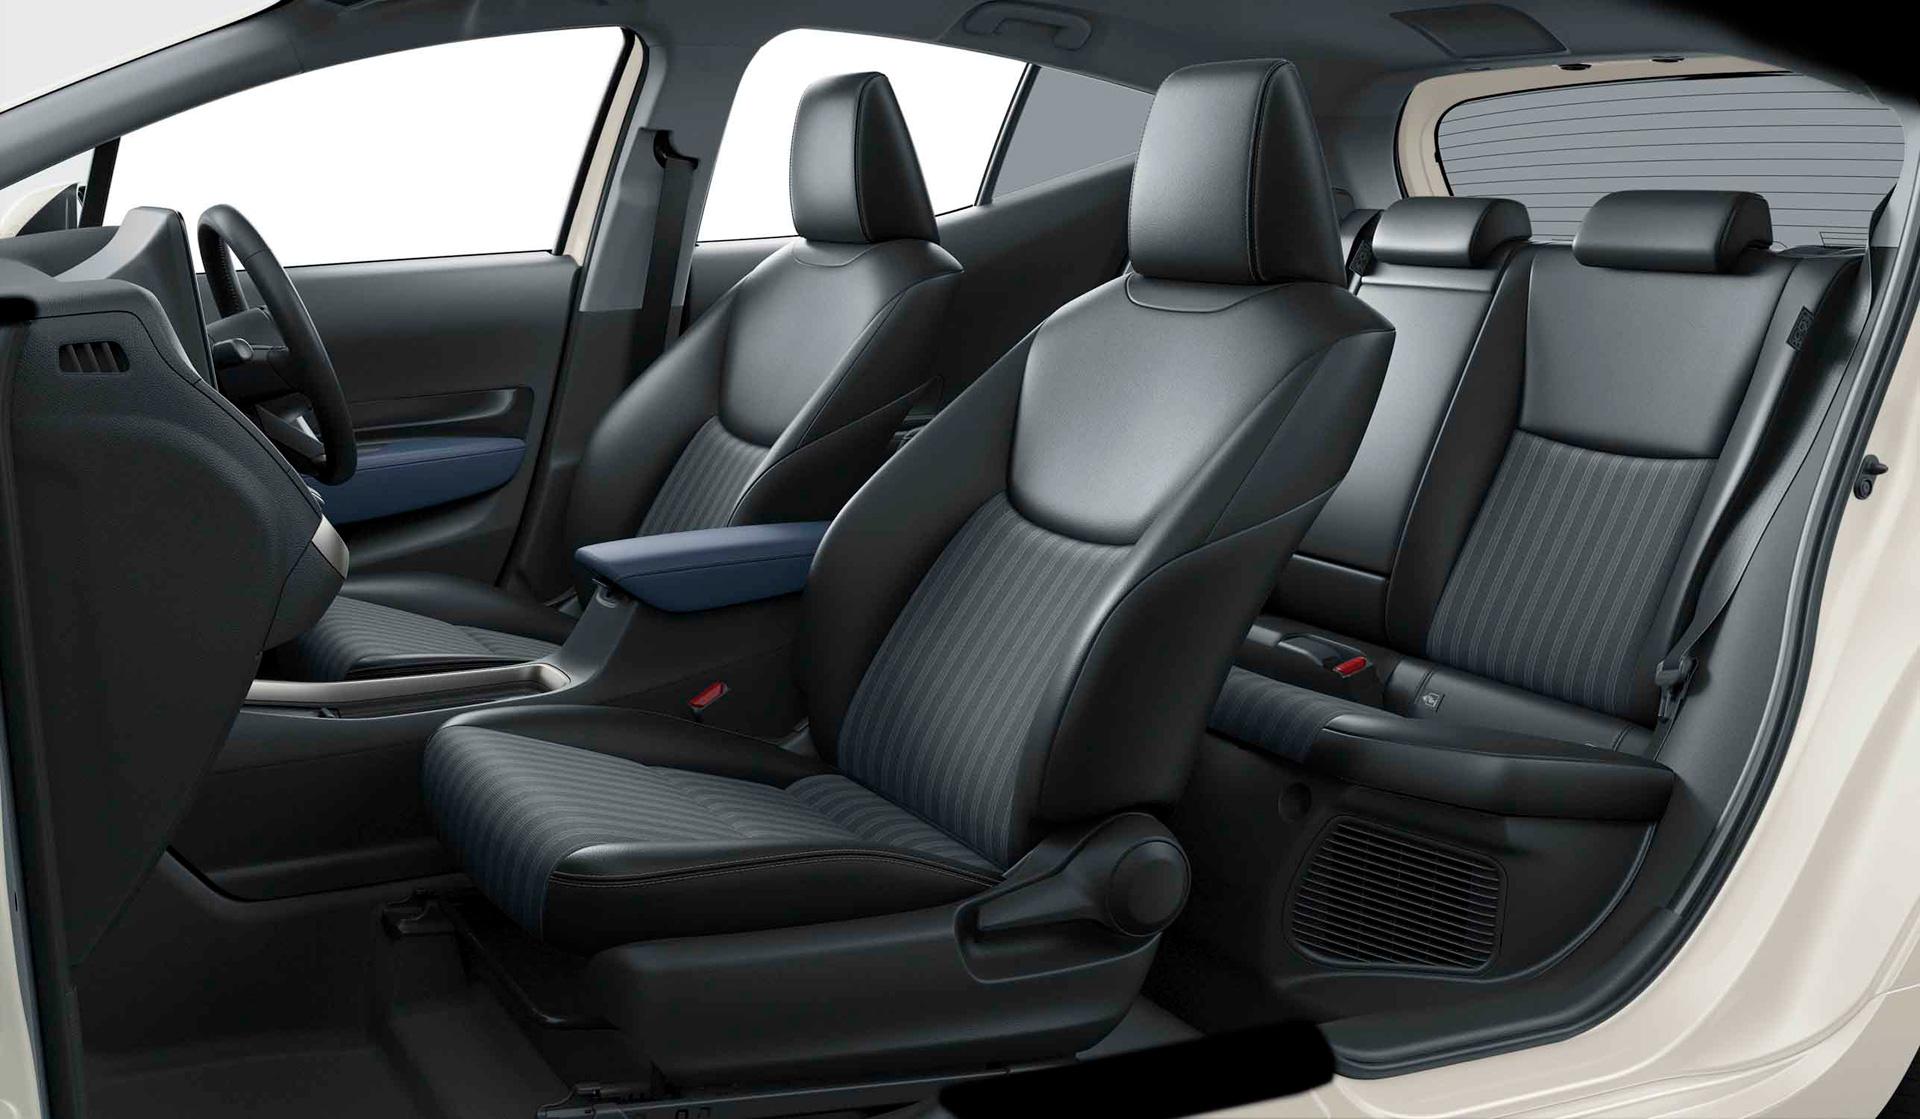 Toyota to Launch All-New Aqua - Image 1